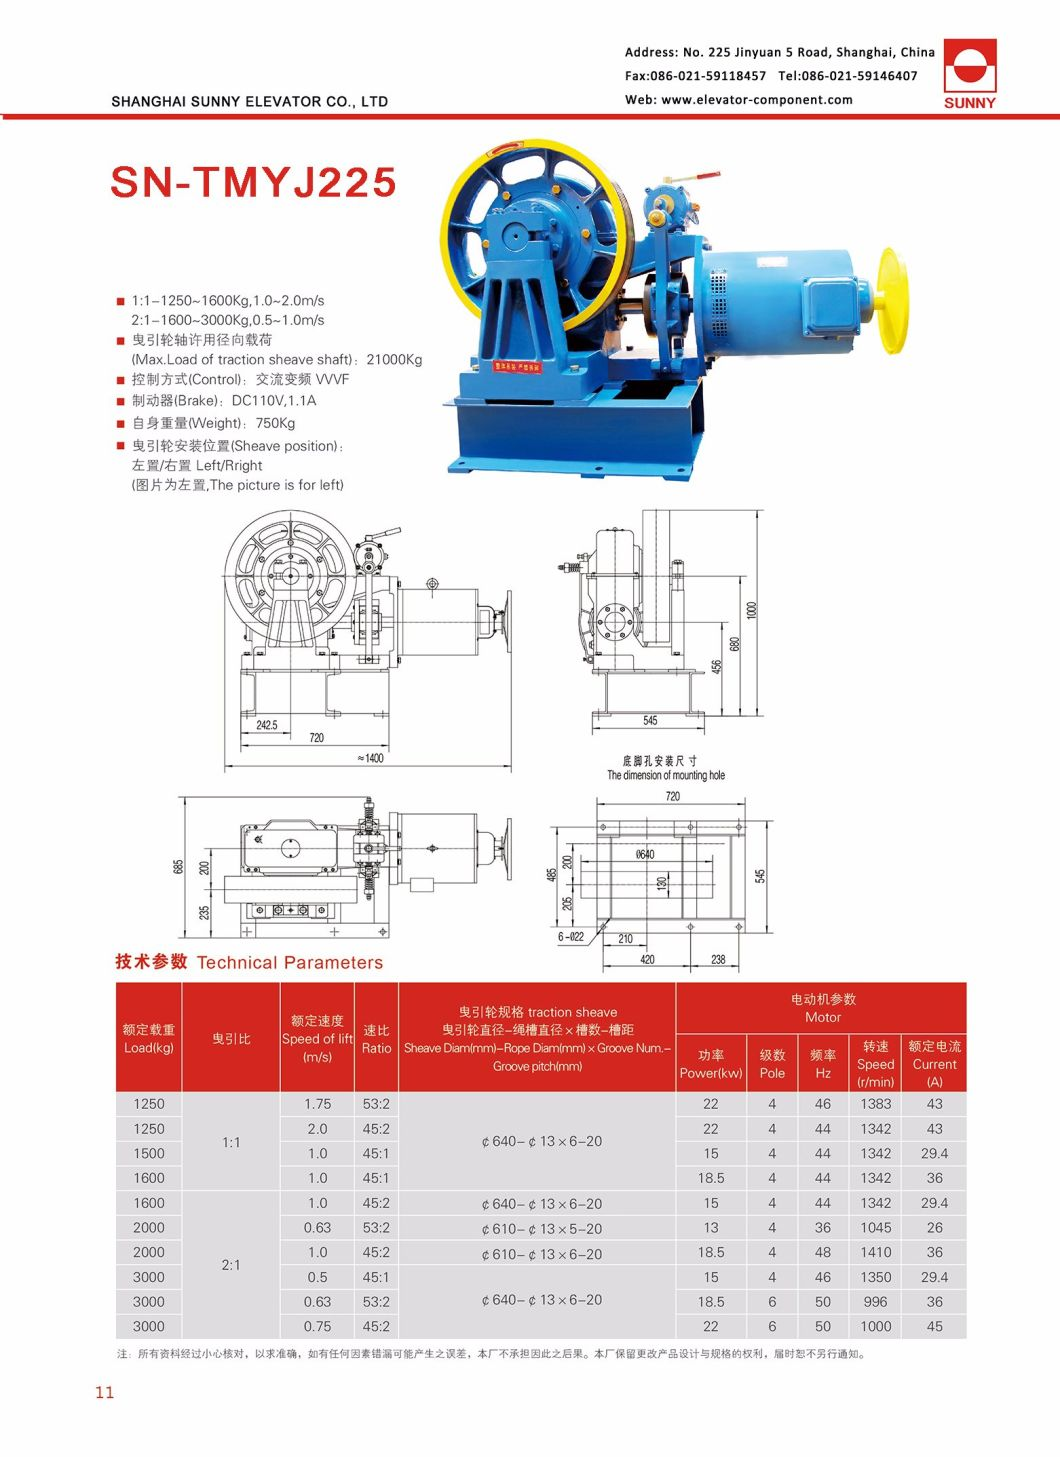 Elevator Geared Machine Sn-Yj225 (3000-3200KG, 0.5m/s)